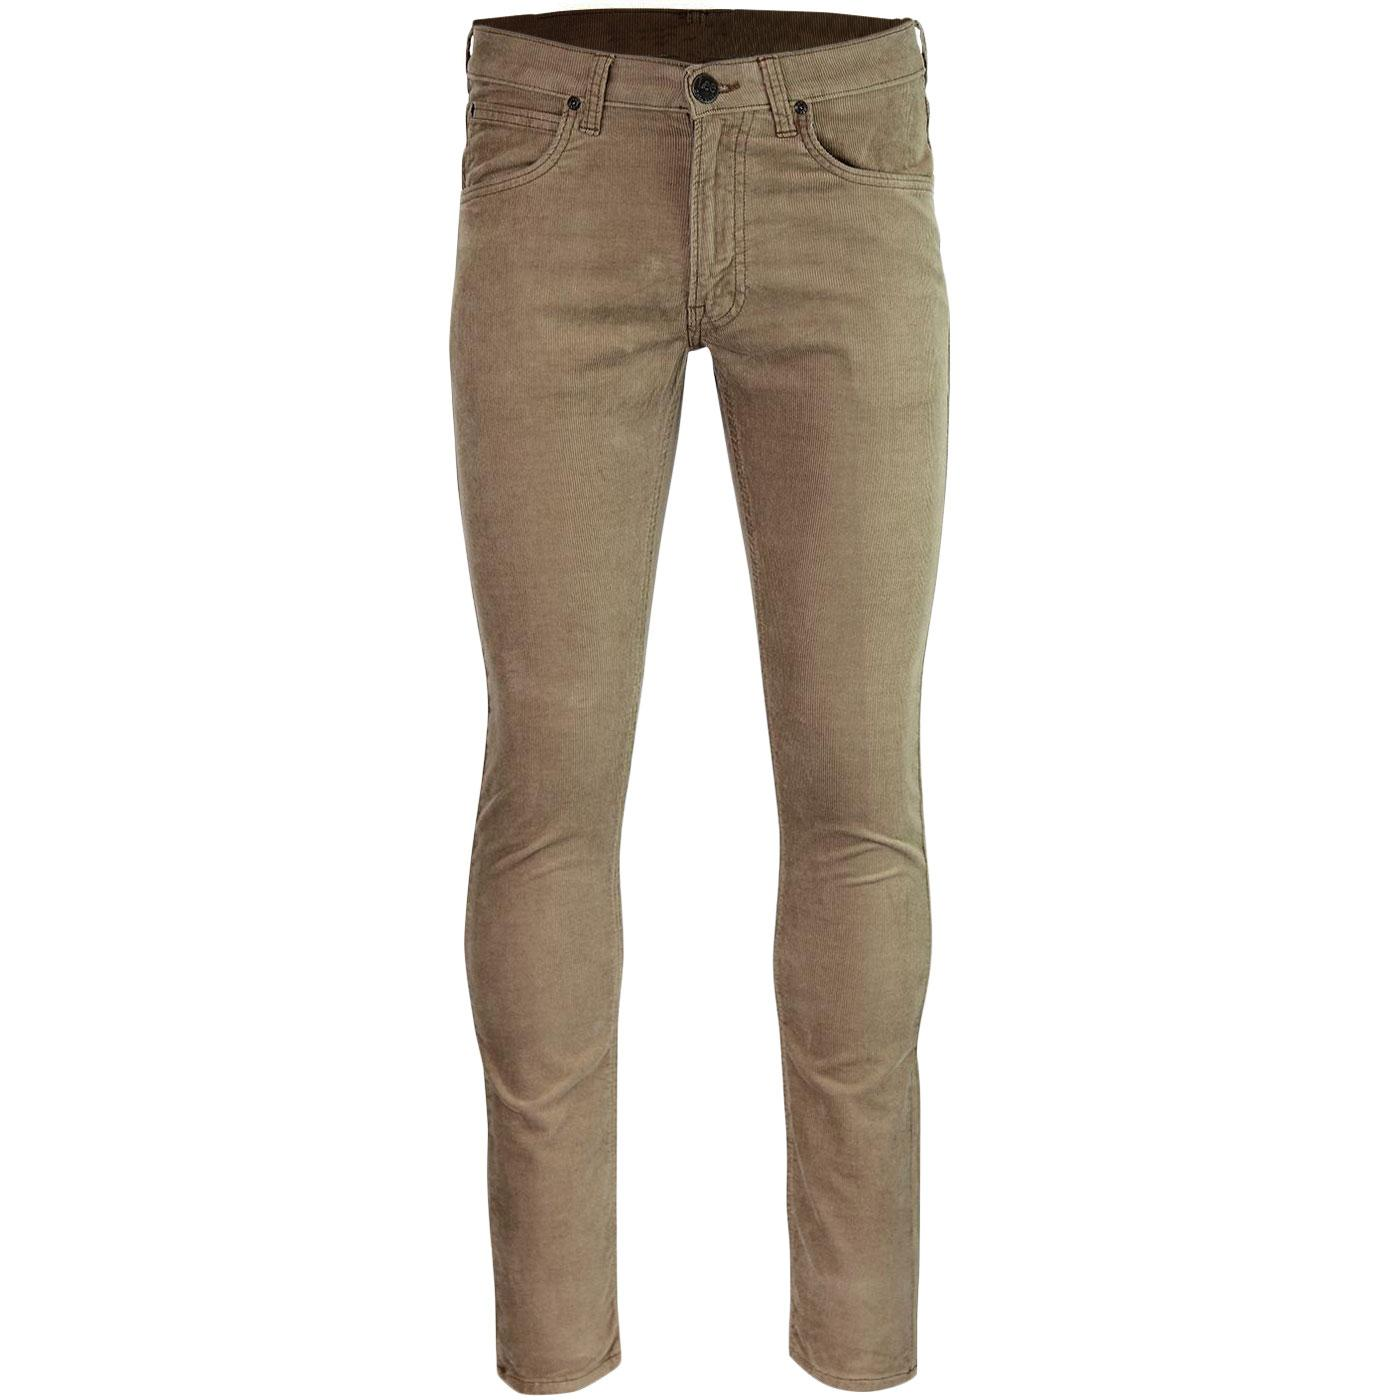 Luke LEE Mens Mod Slim Tapered Cord Jeans ANTELOPE